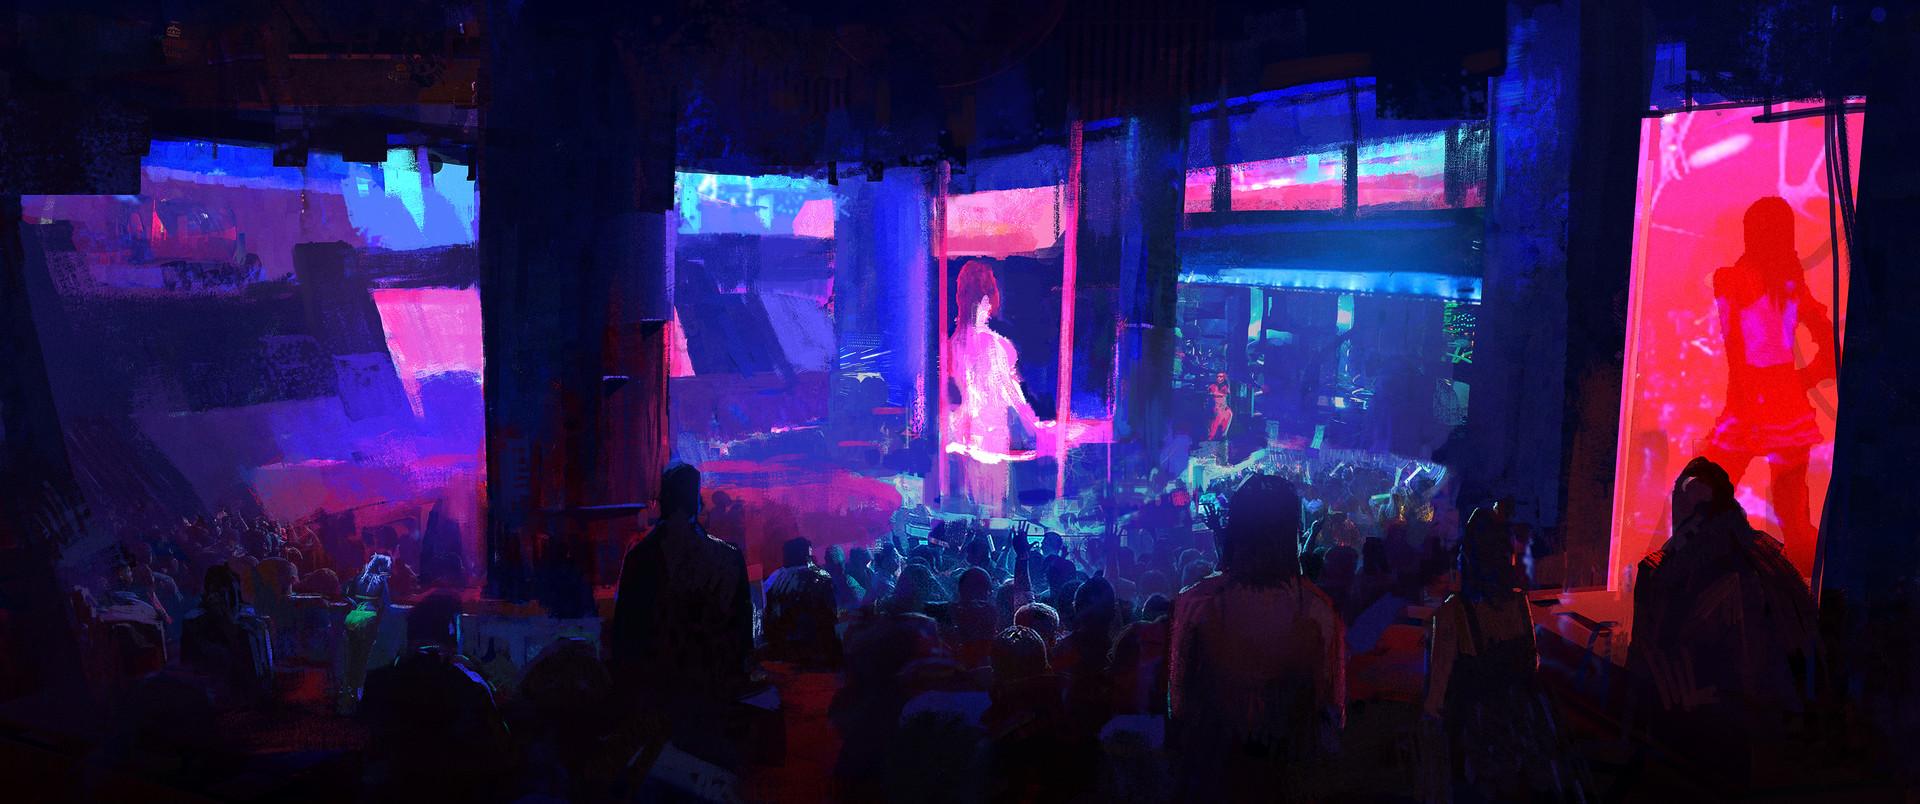 Liang mark night club 2